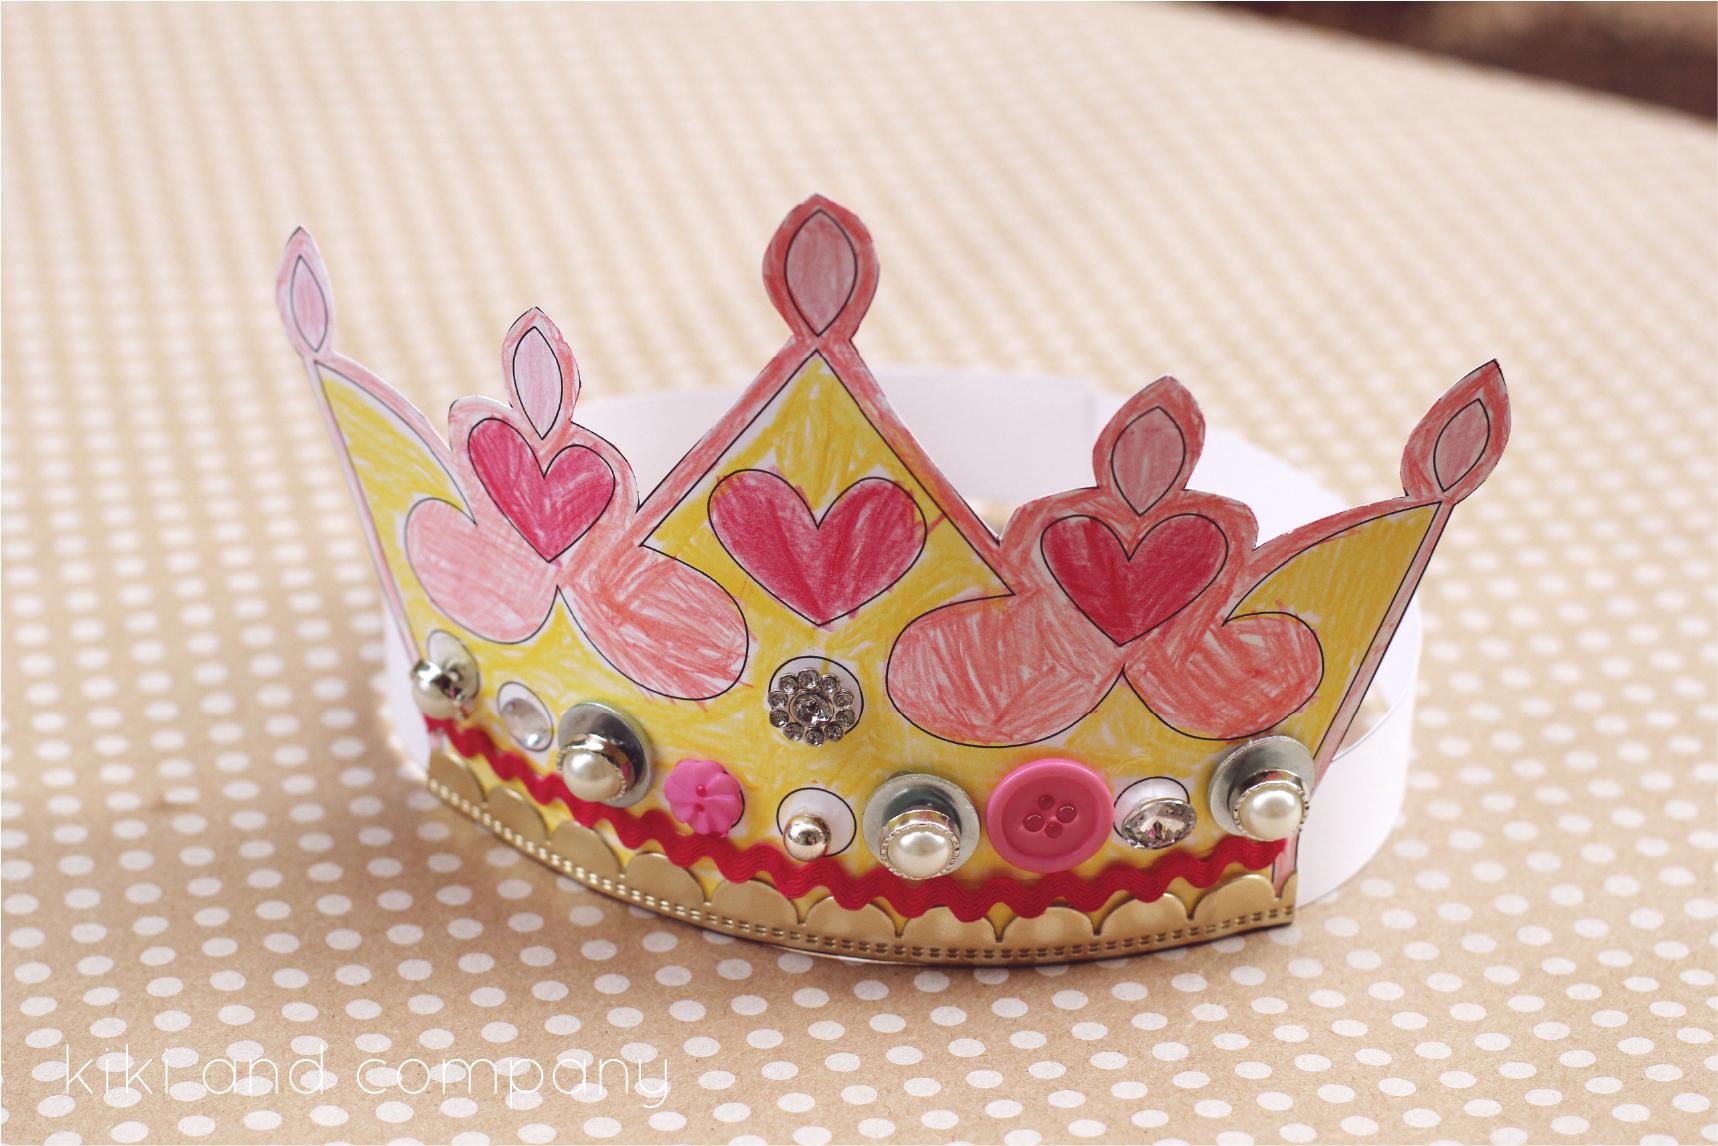 Printable Kings And Queens Crown {Free Printable}   Crafts   King - Free Printable Crown